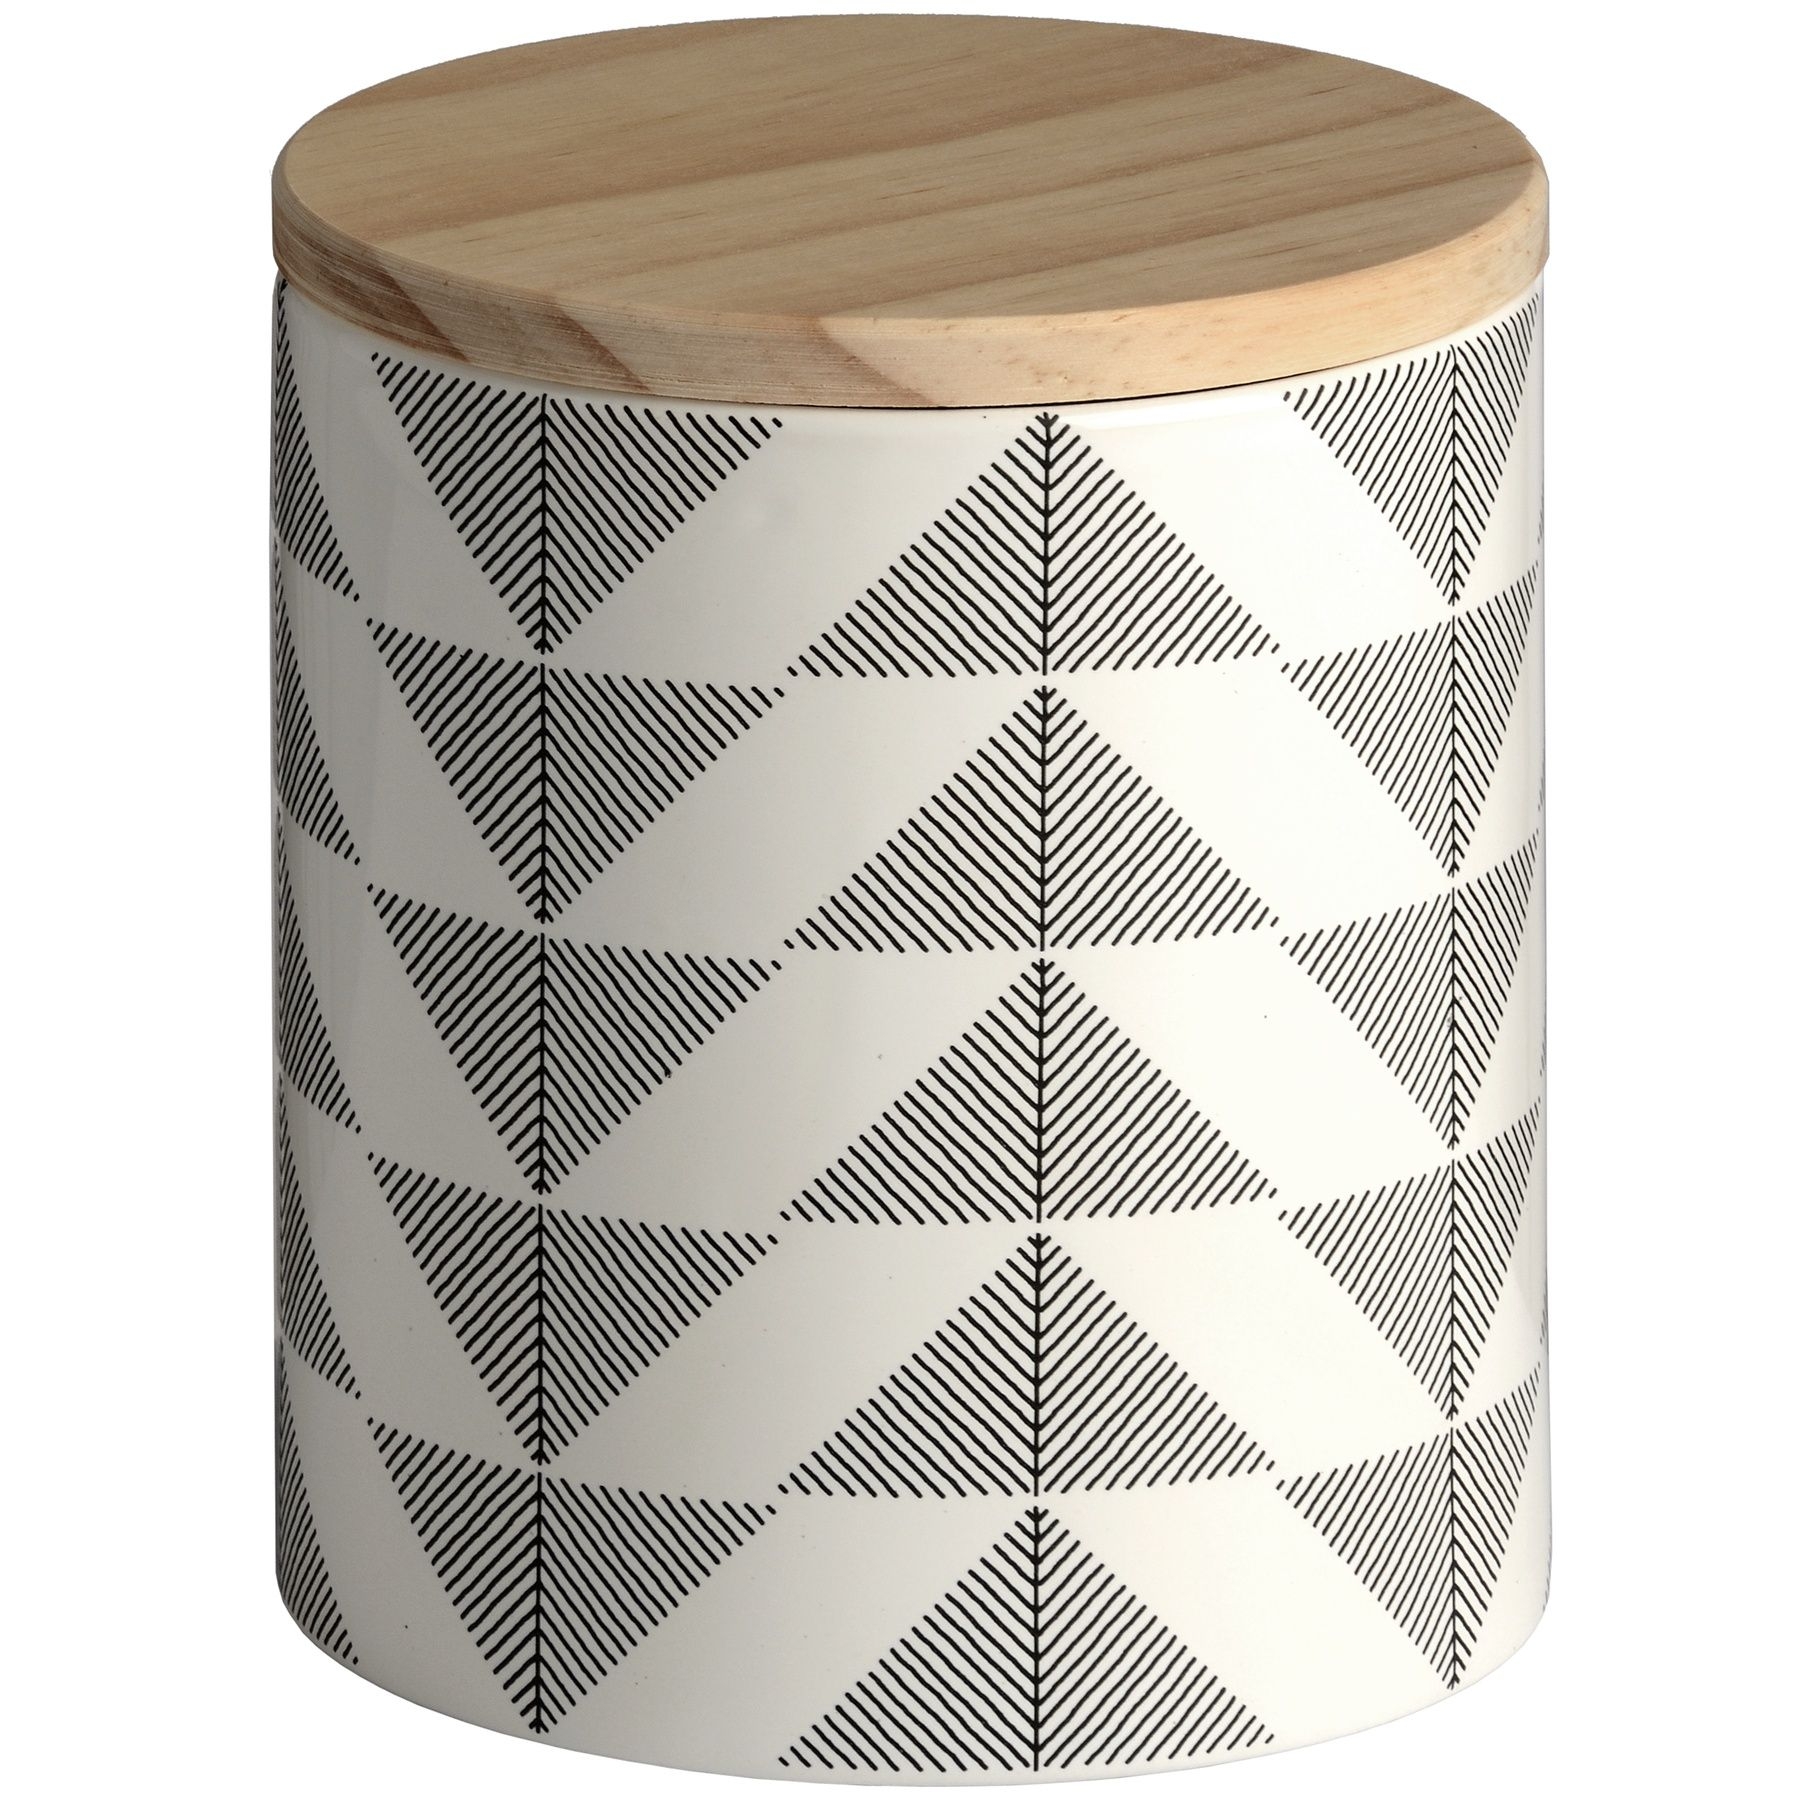 ceramic geometric storage jar storage jars geometric designs ceramic geometric storage jar storage jarswhite ceramicskitchen